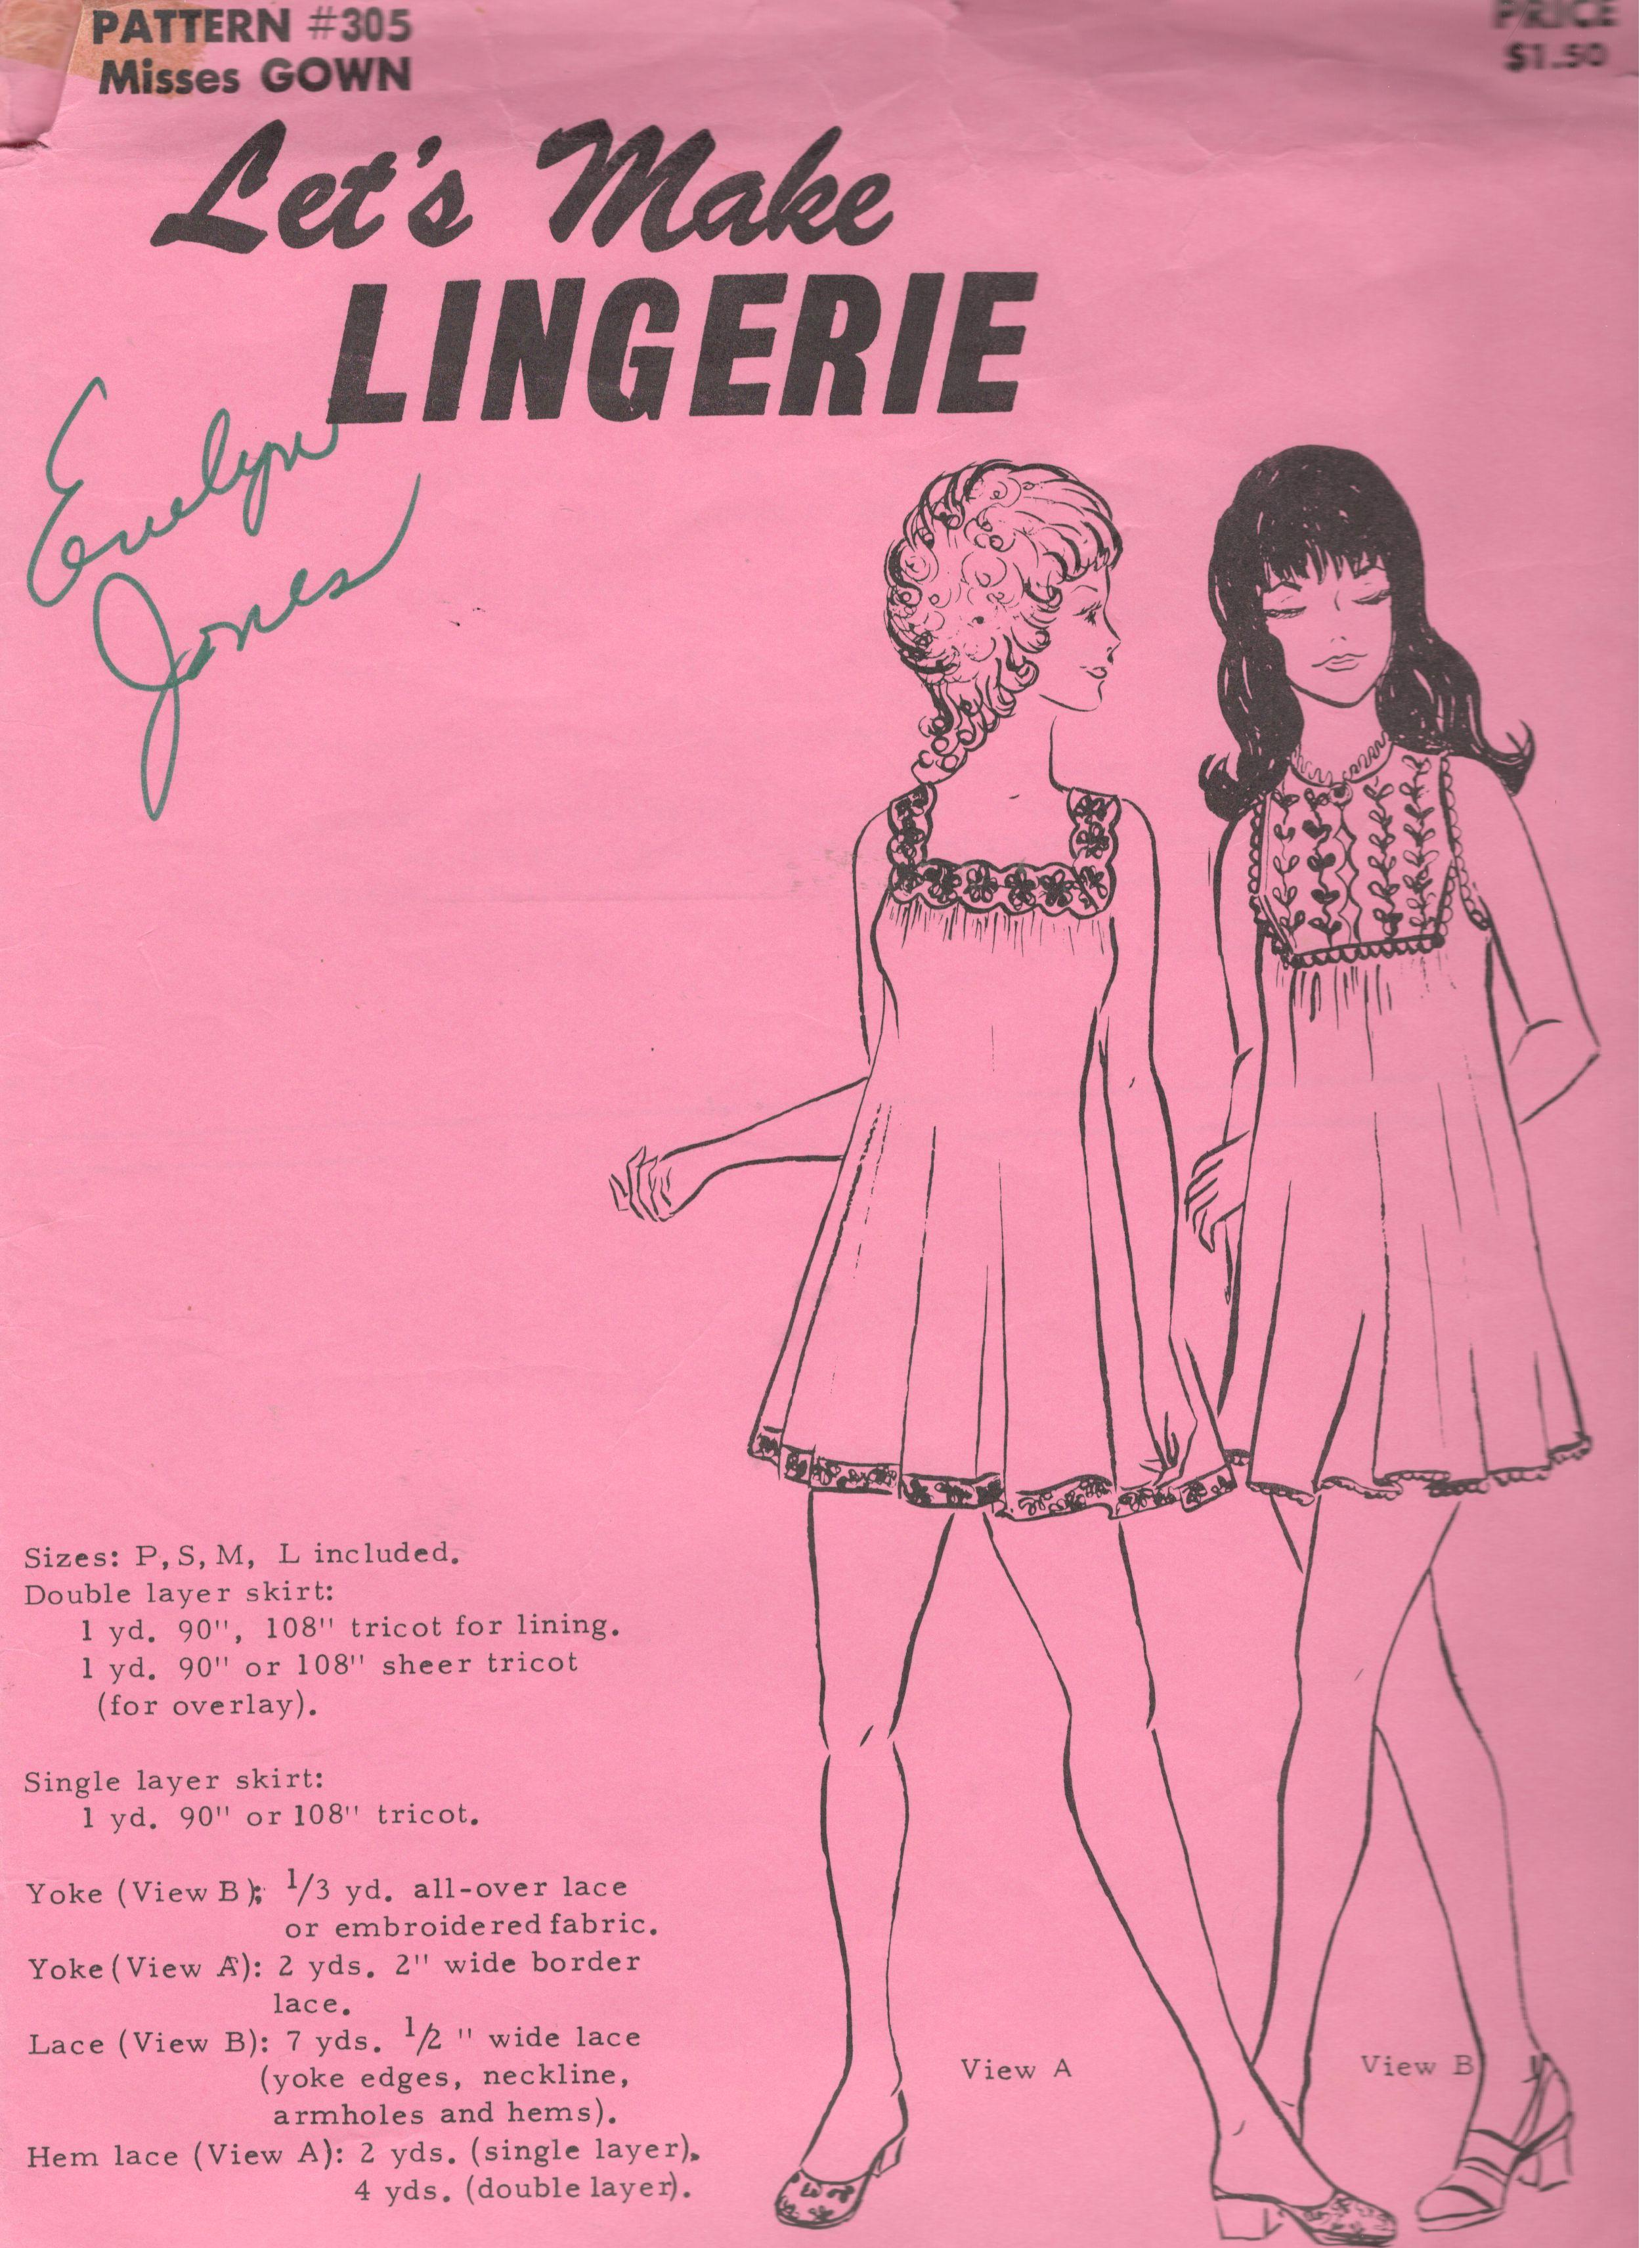 Let's Make Lingerie 305